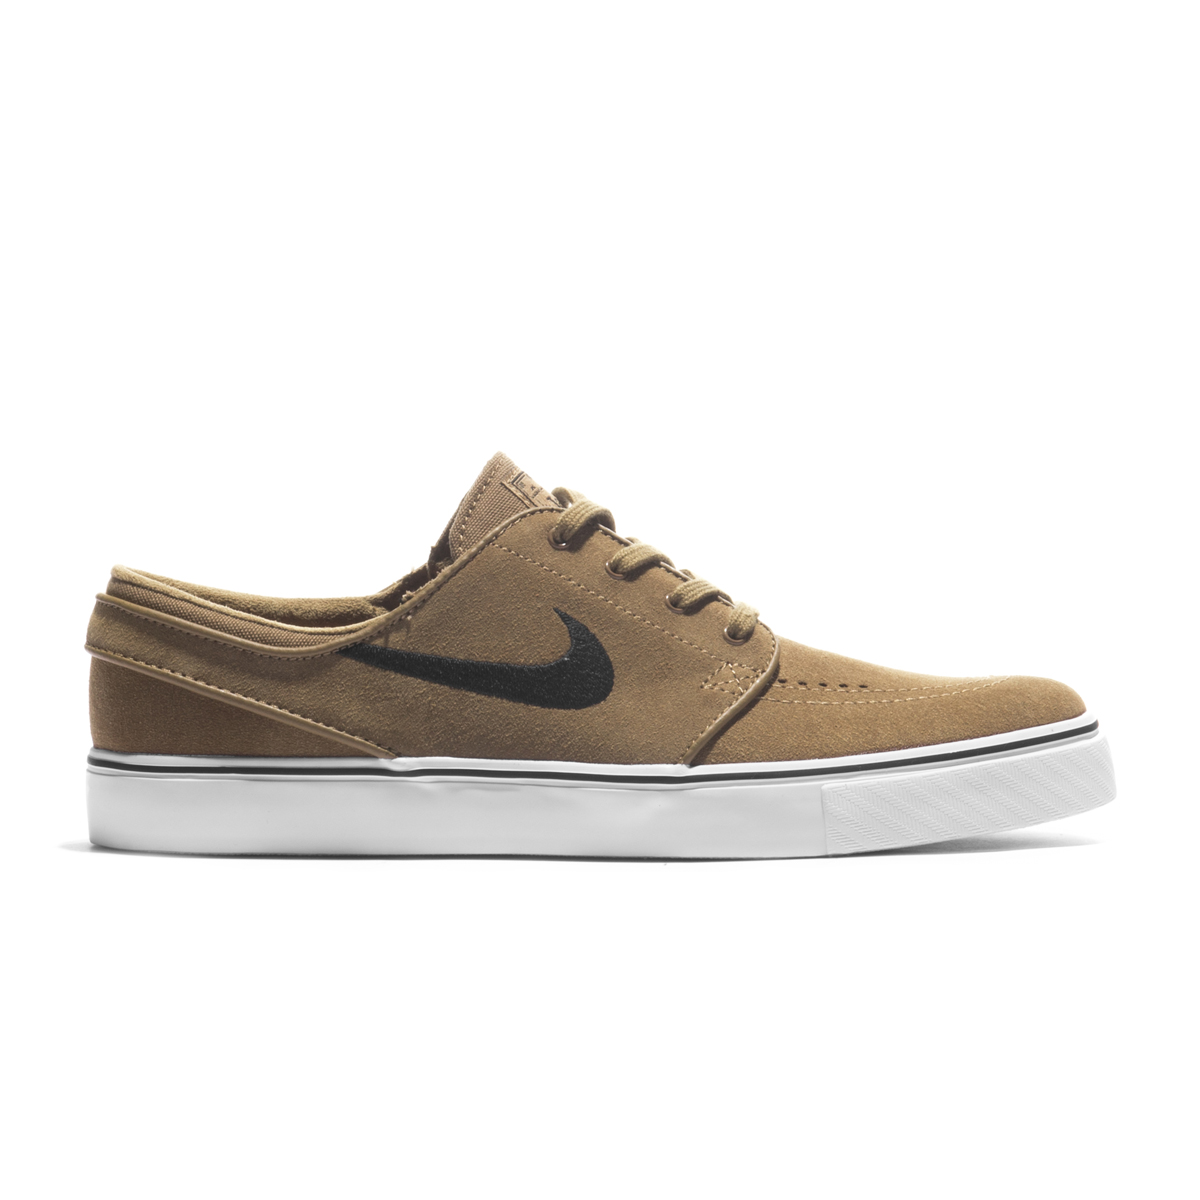 Buty Nike SB Zoom Stefan Janoski Golden Beige   Black   Sklep AveBmx ... 94b0c3bad55bc